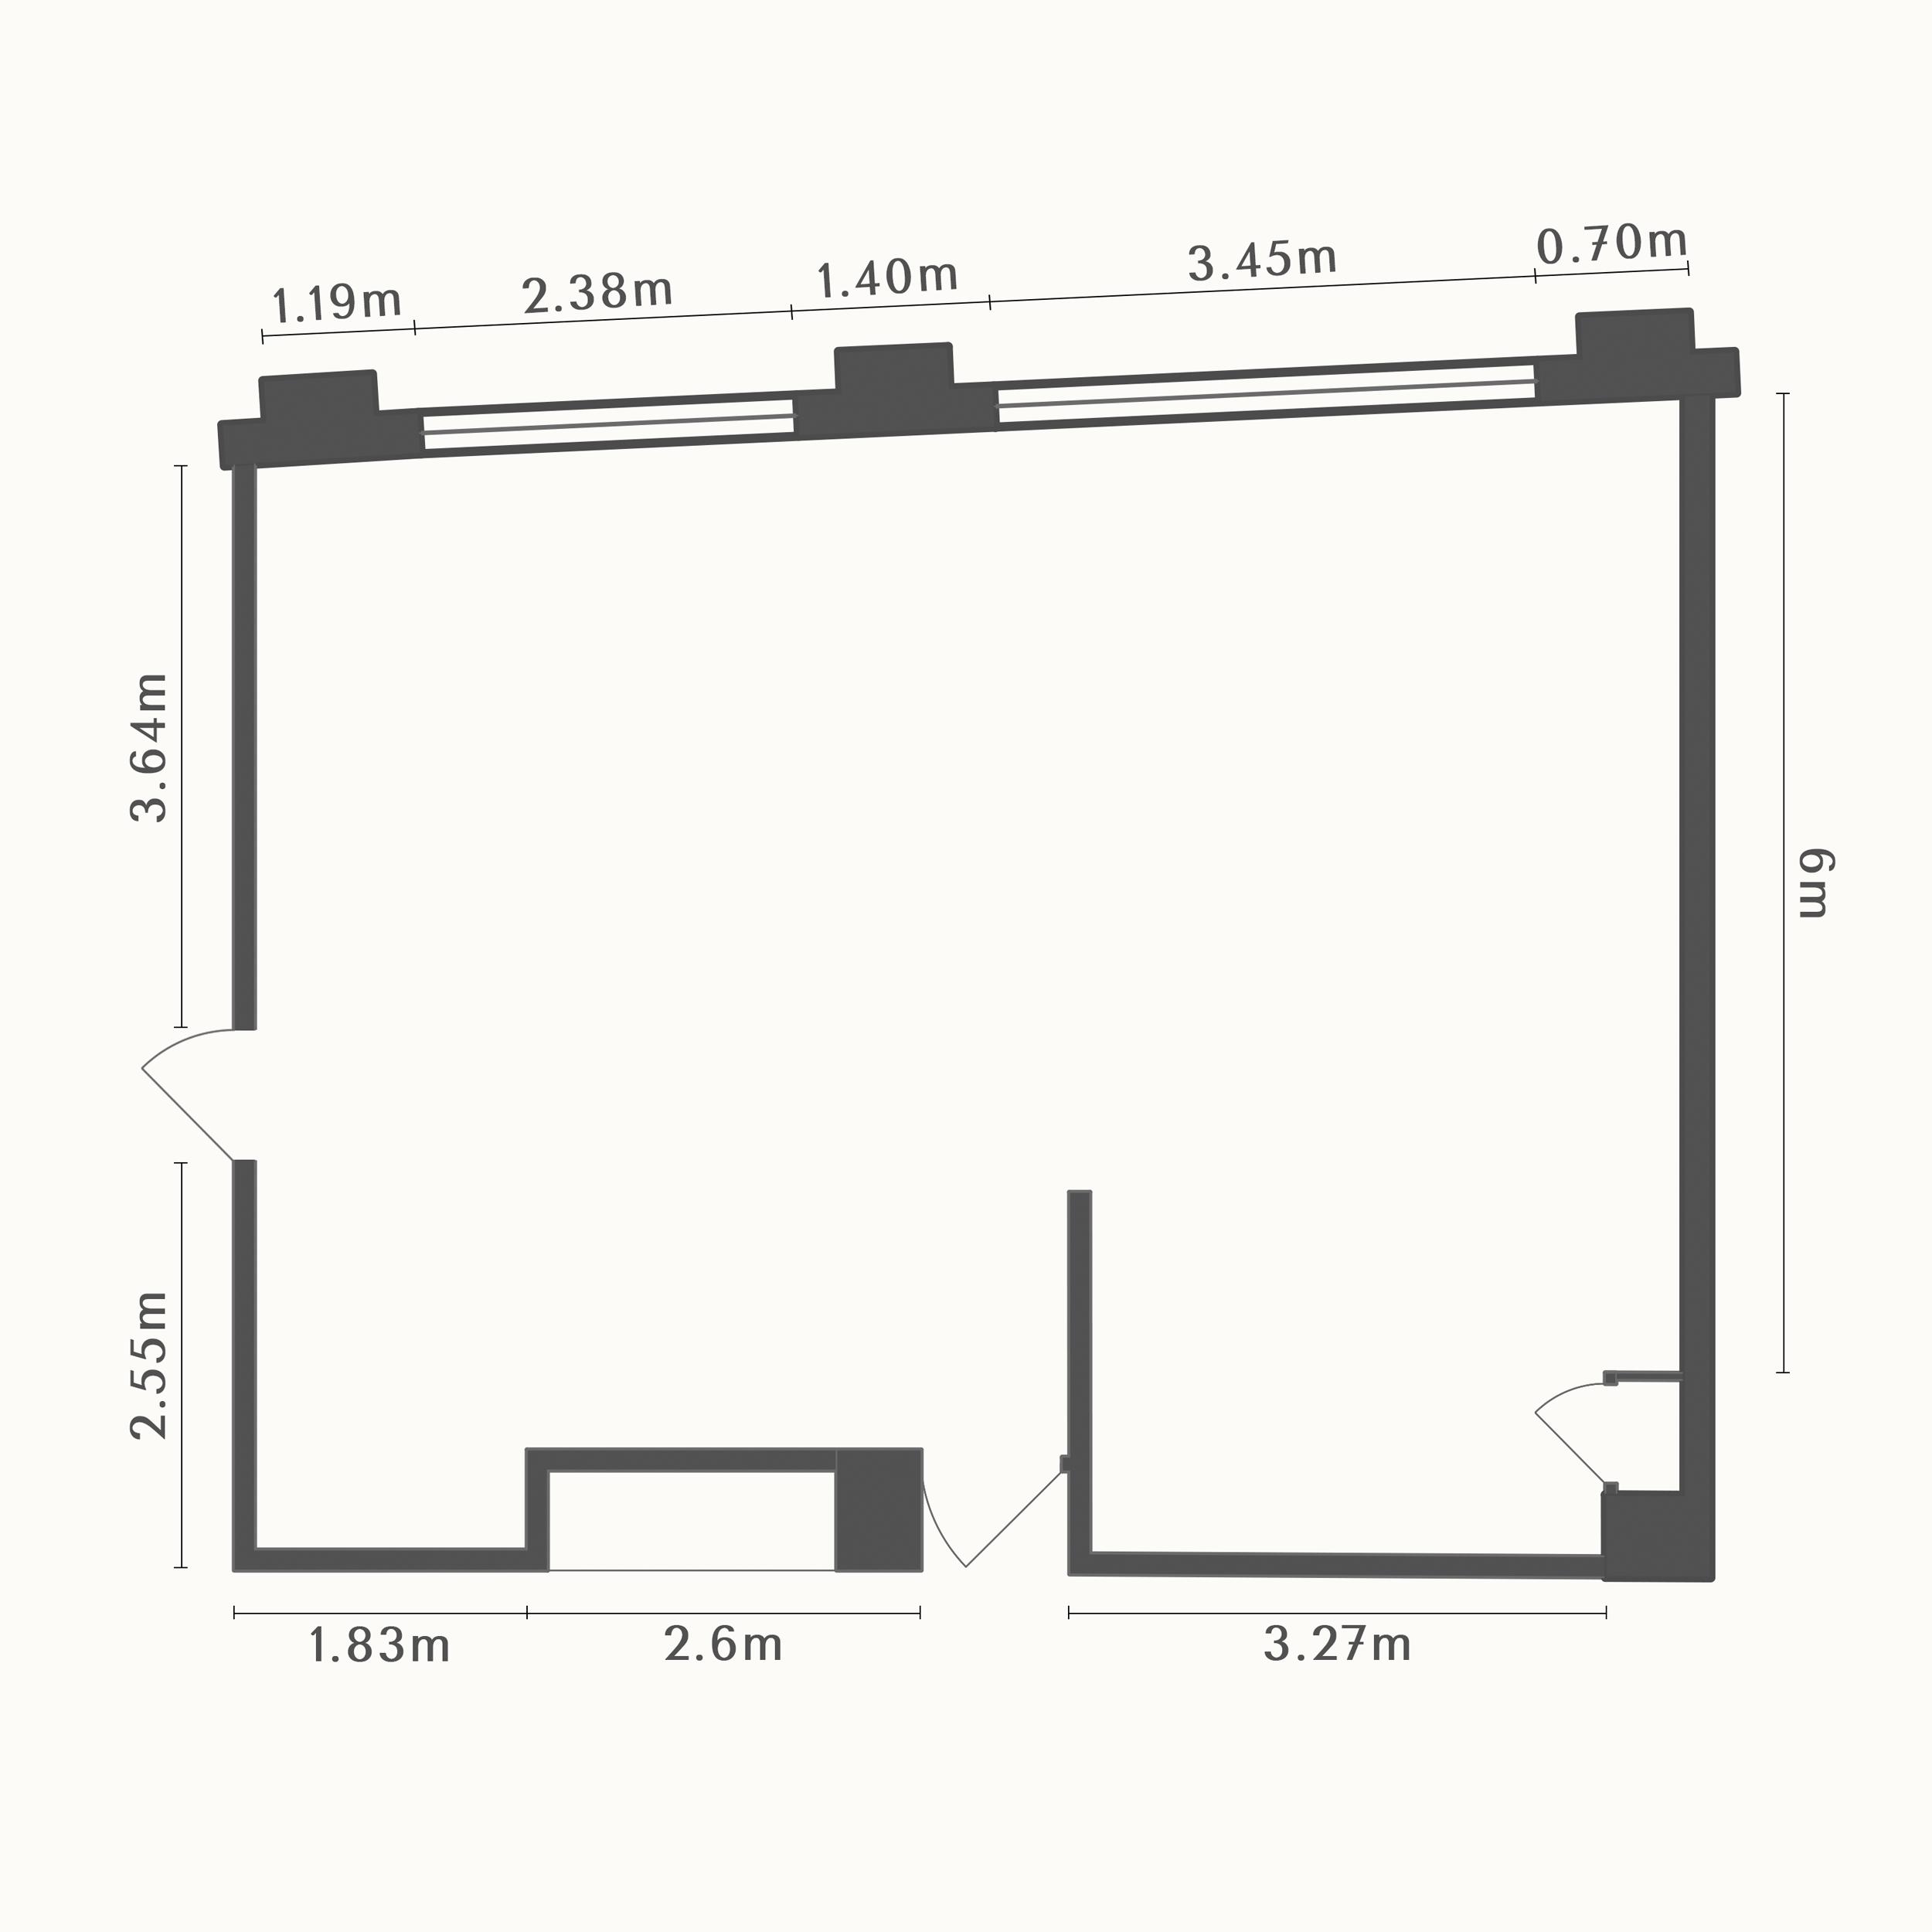 Archway-Depot-Plans-Smaller-Studio.jpg